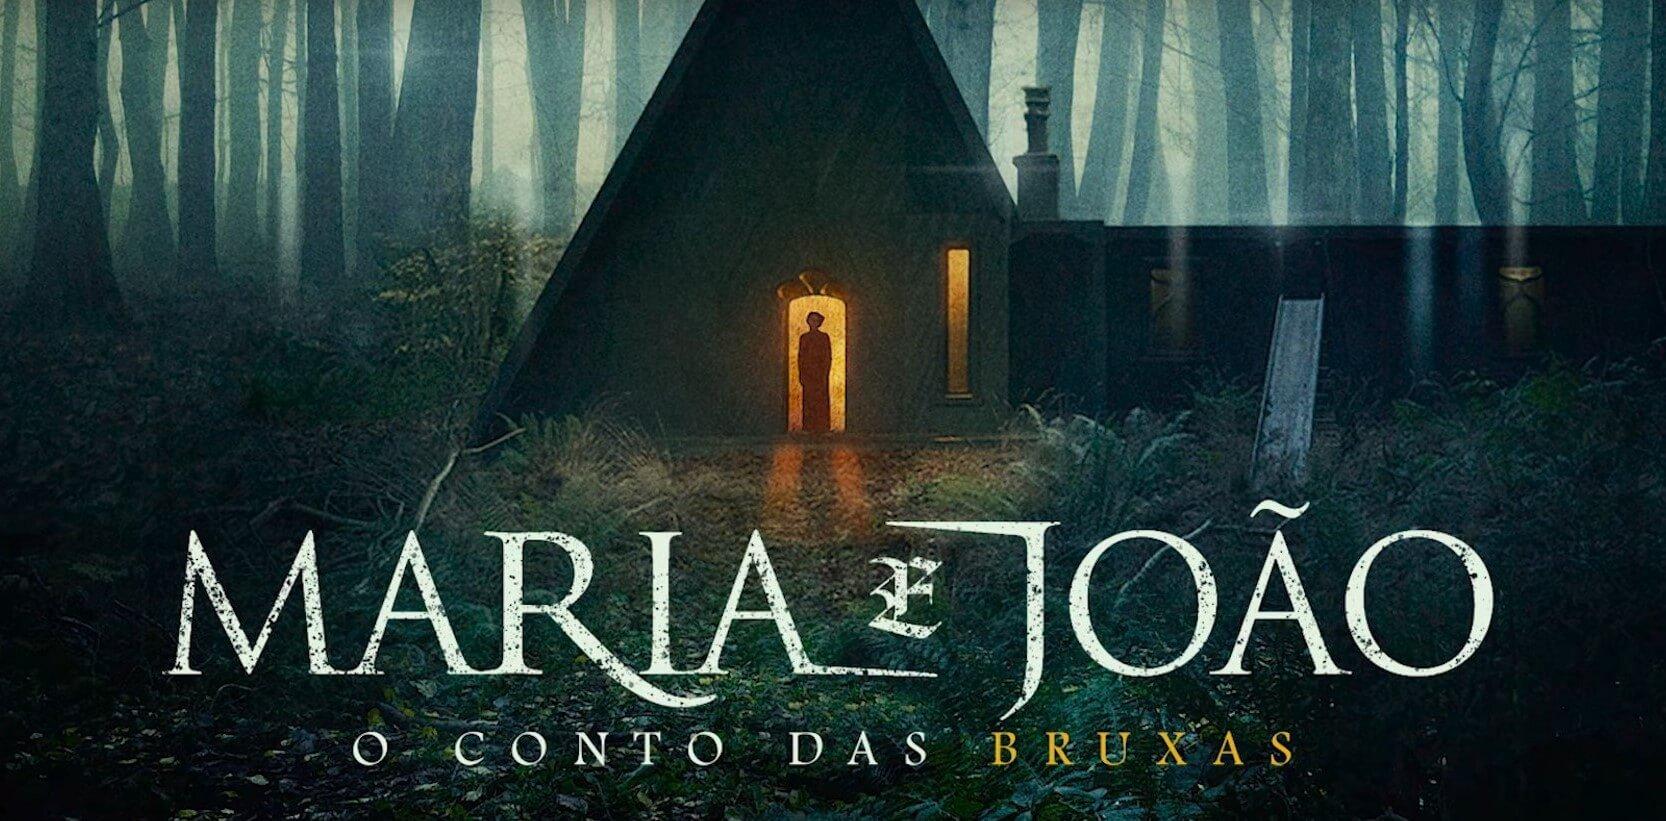 Maria-e-Jo-o-Poster-1